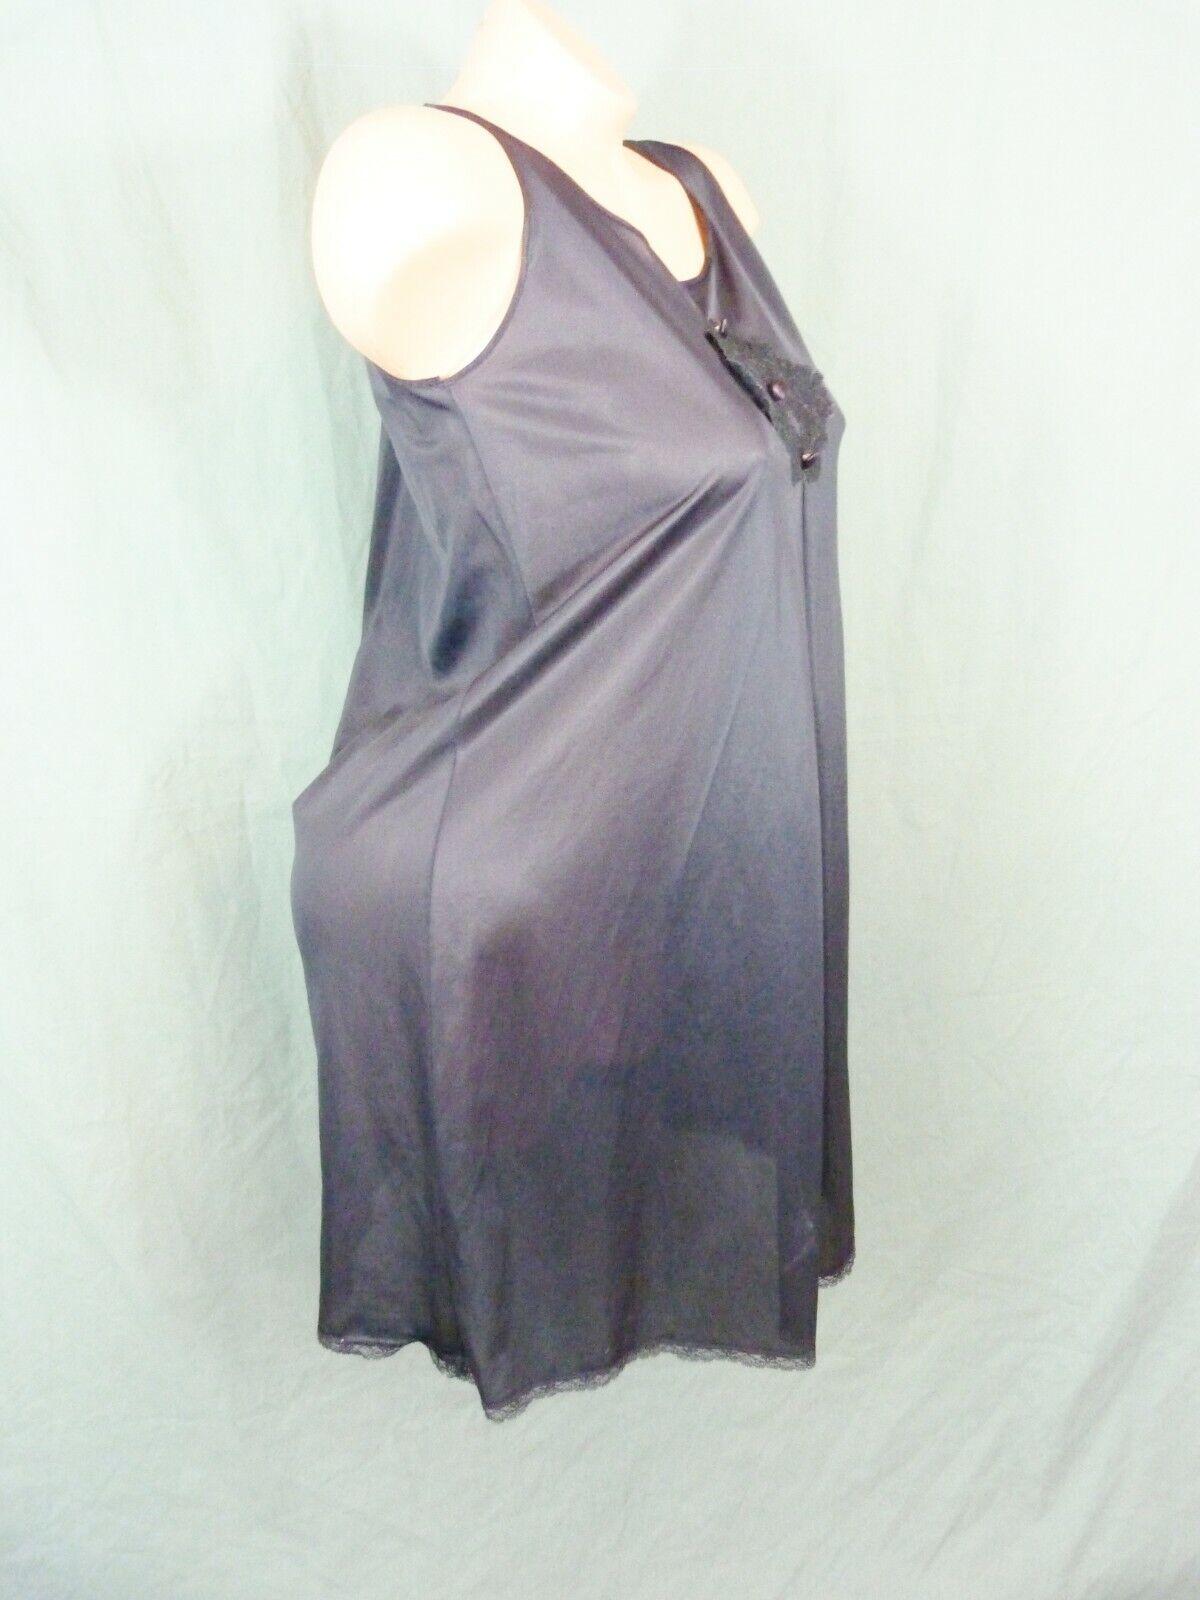 Texsheen Size Medium Full Slip Nightgown - image 8